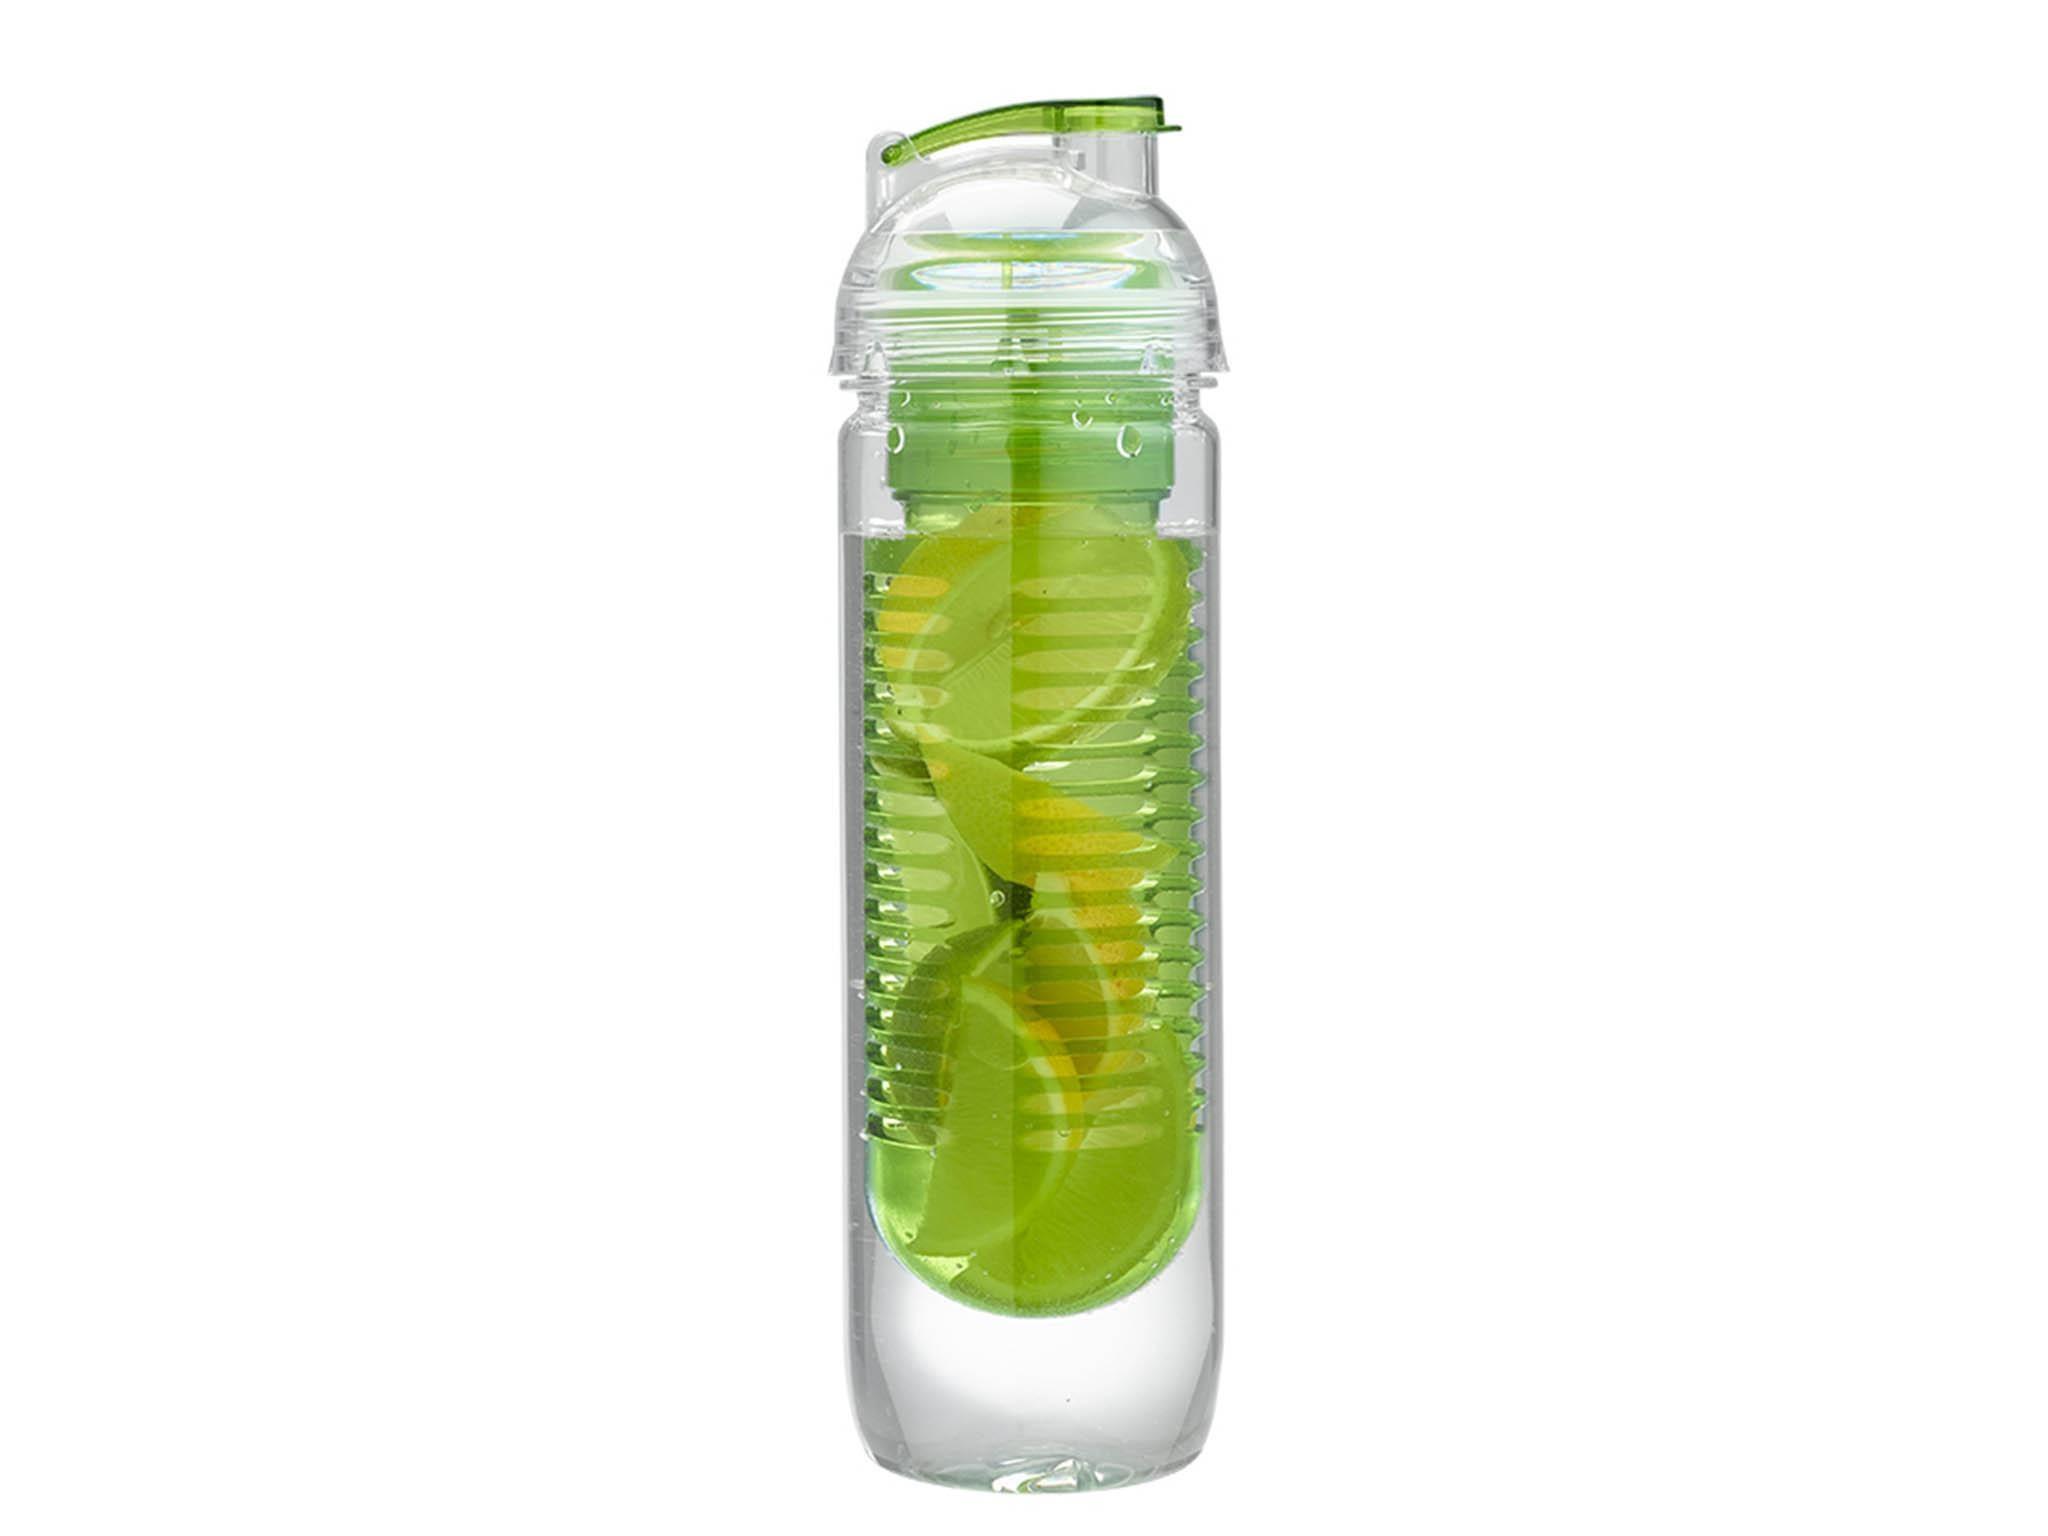 Best reusable water bottle: BPA-free drinking bottles guide to help